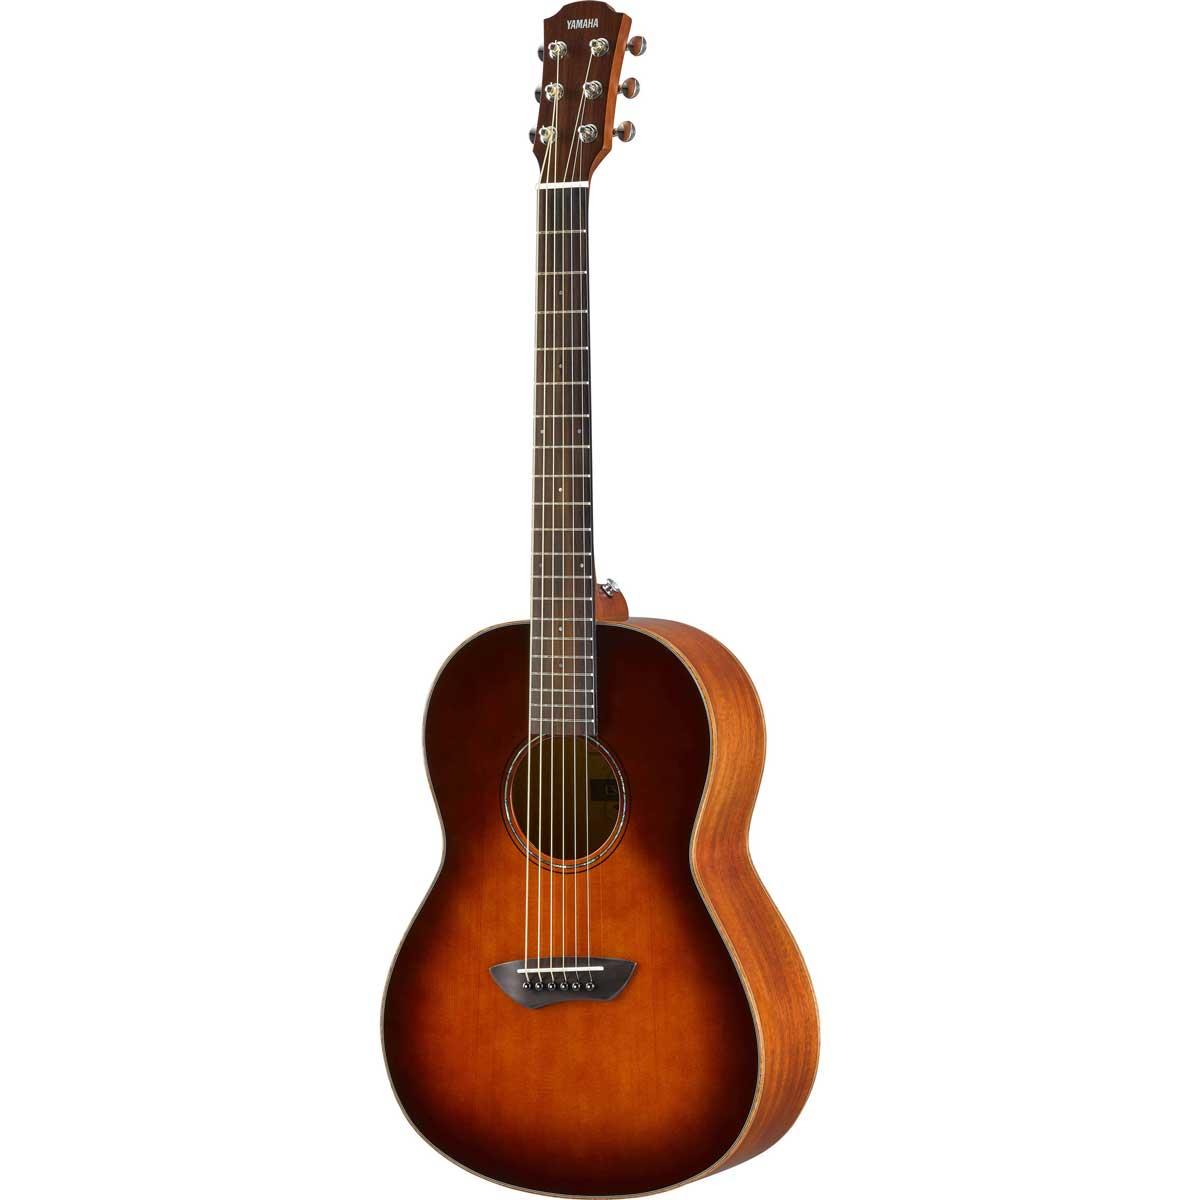 Yamaha CSF3M TBS western-guitar tobacco brown sunburst